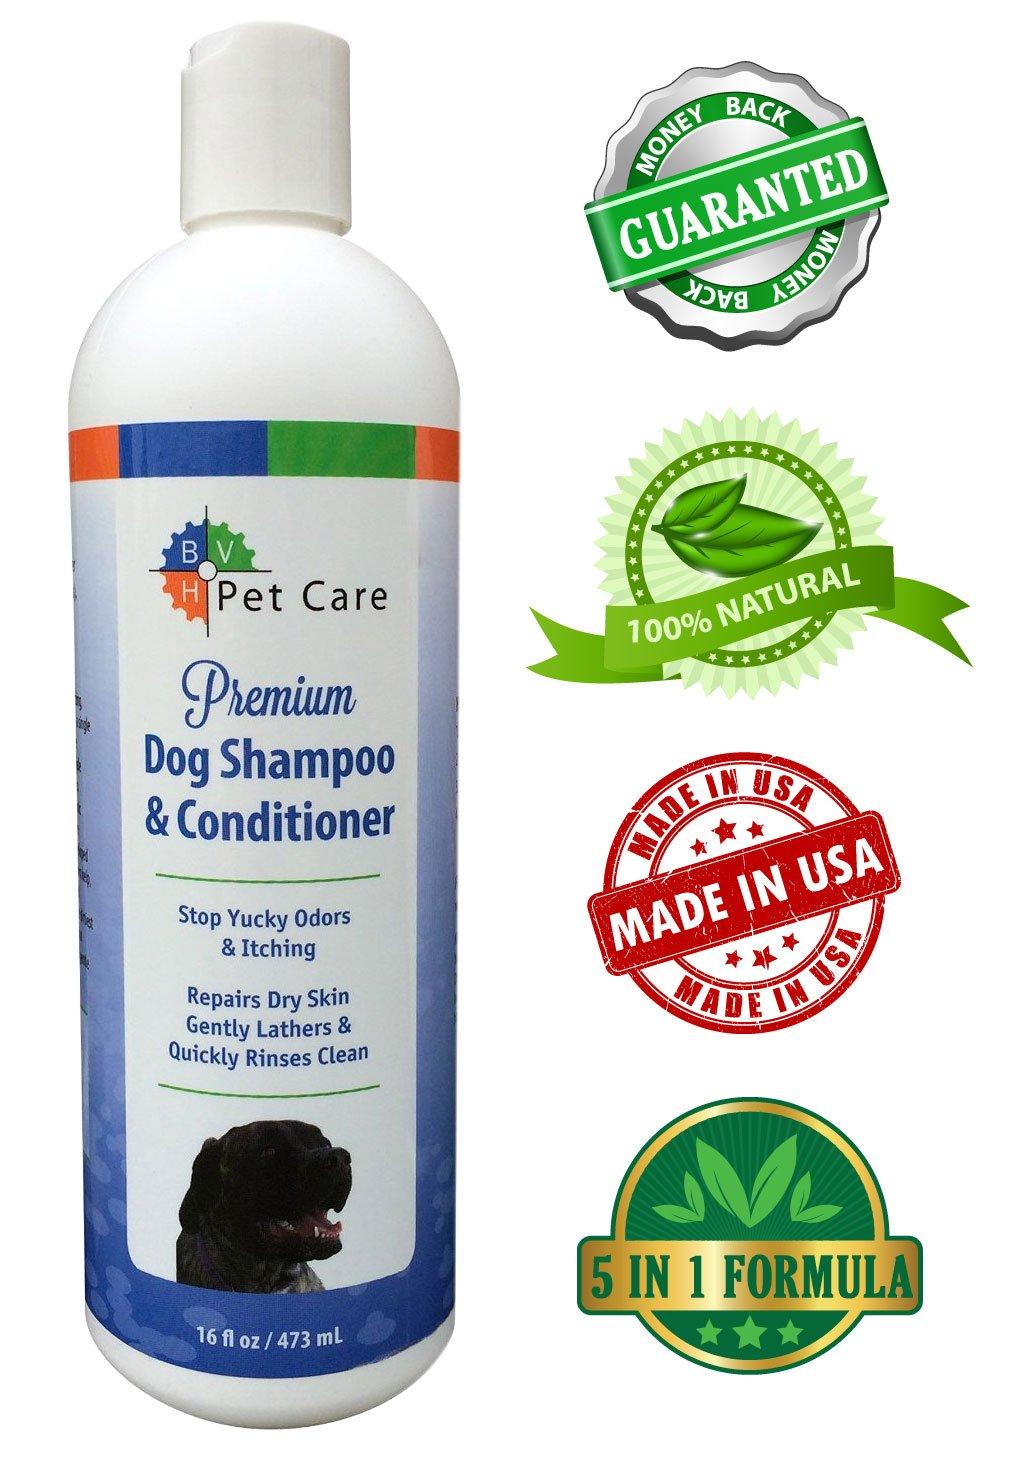 Skin Shampoo For Dogs Dog Shampoo Reviews